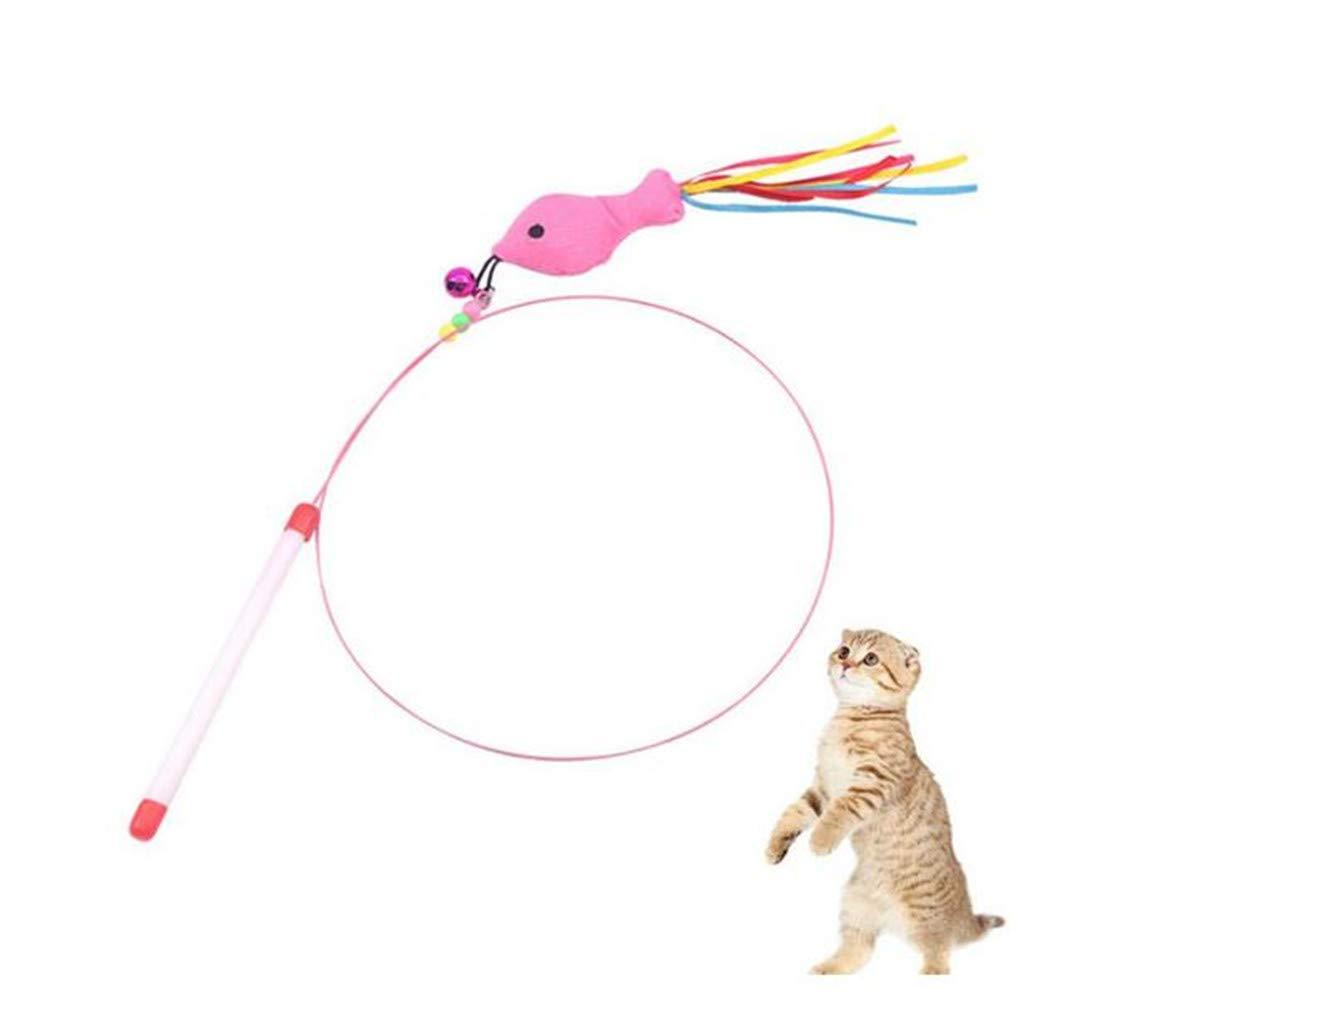 DTOL Kitten Cat Interactive Toy Fishing Rod Kitten Cat Teasing Interactive Toy Fishing Rod Fish Belt Bell Pet Supplies Pet Toys